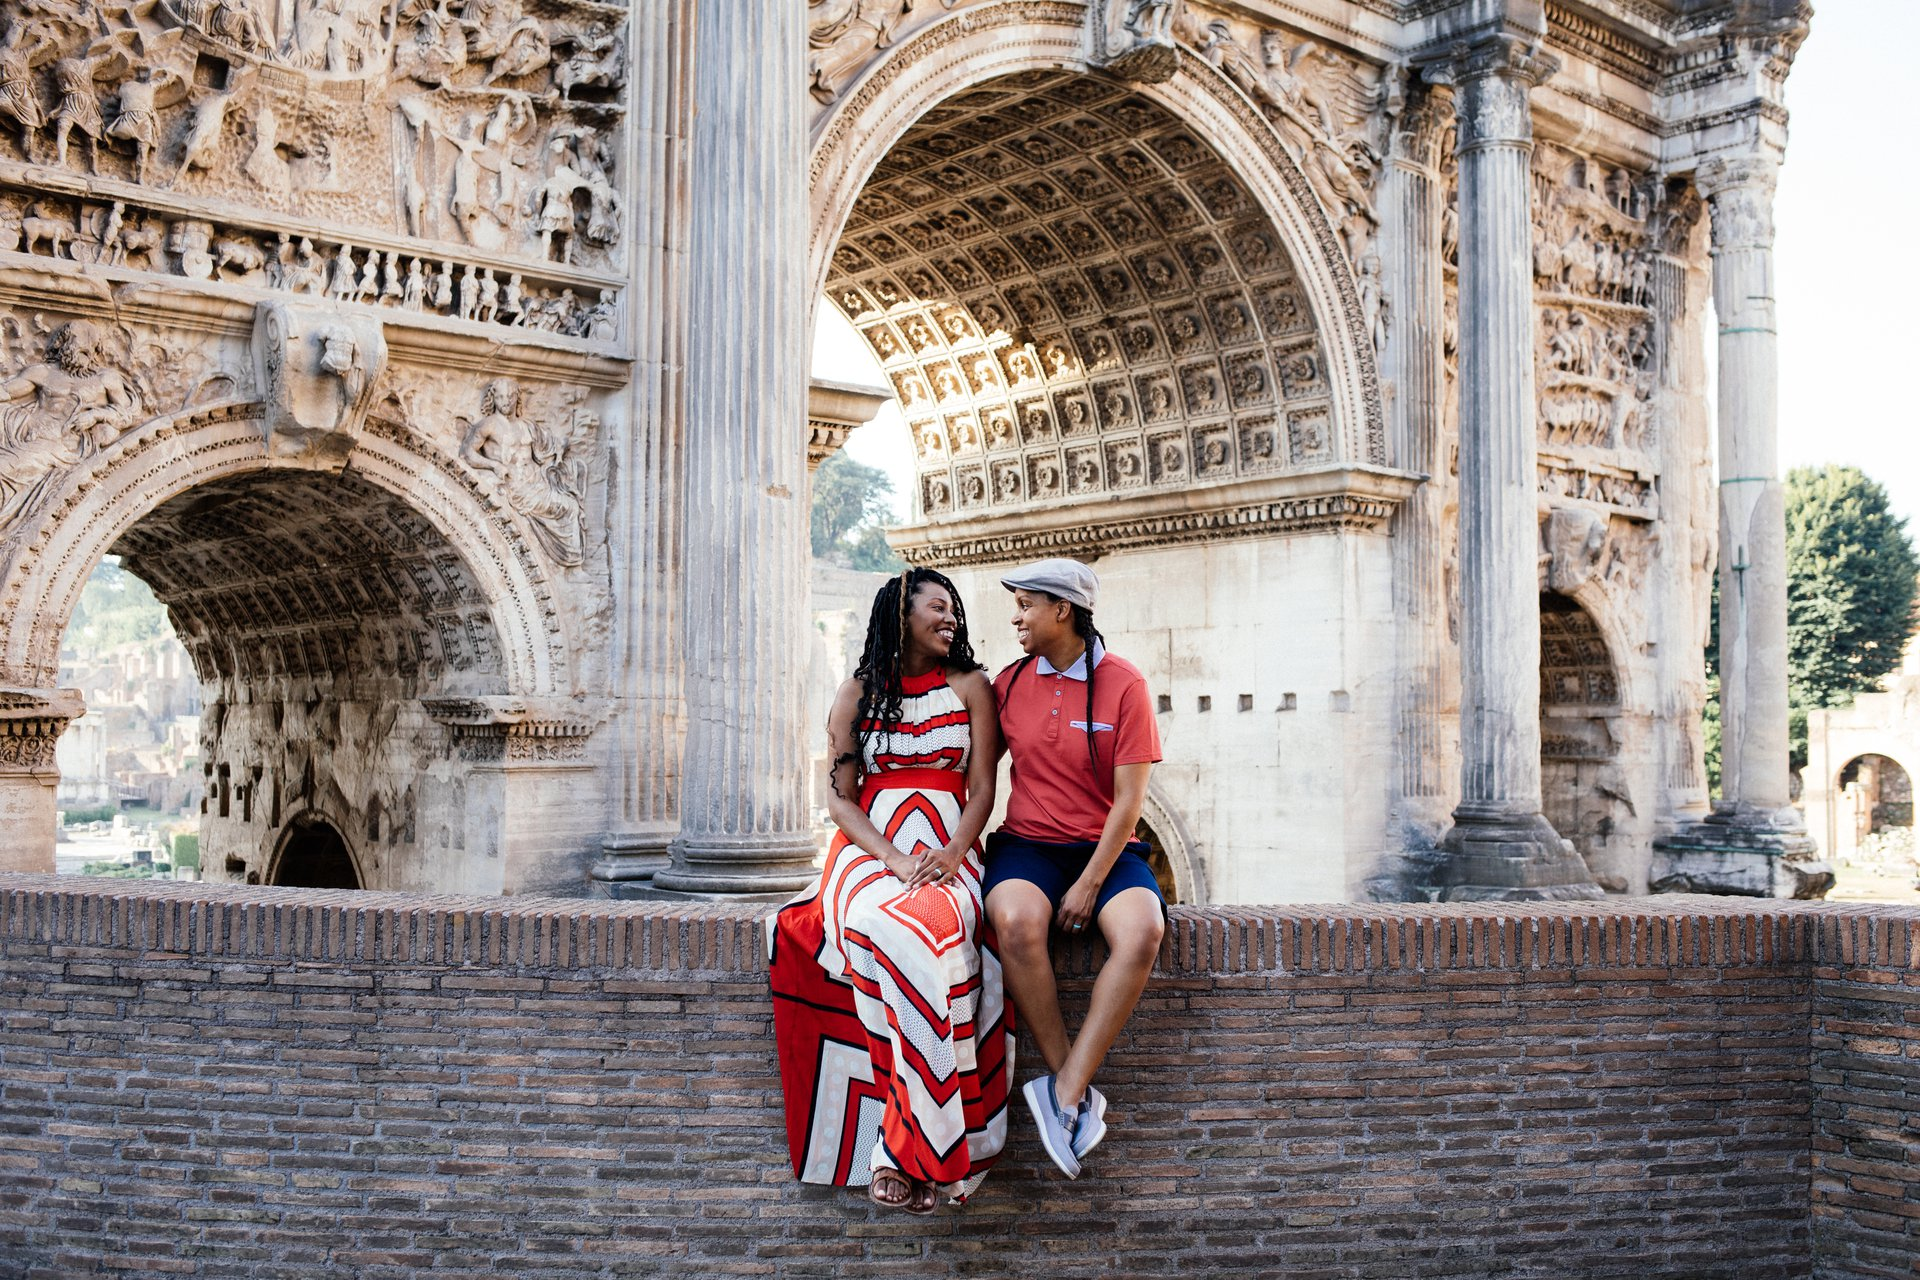 Rome-Italy-travel-story-Flytographer-50